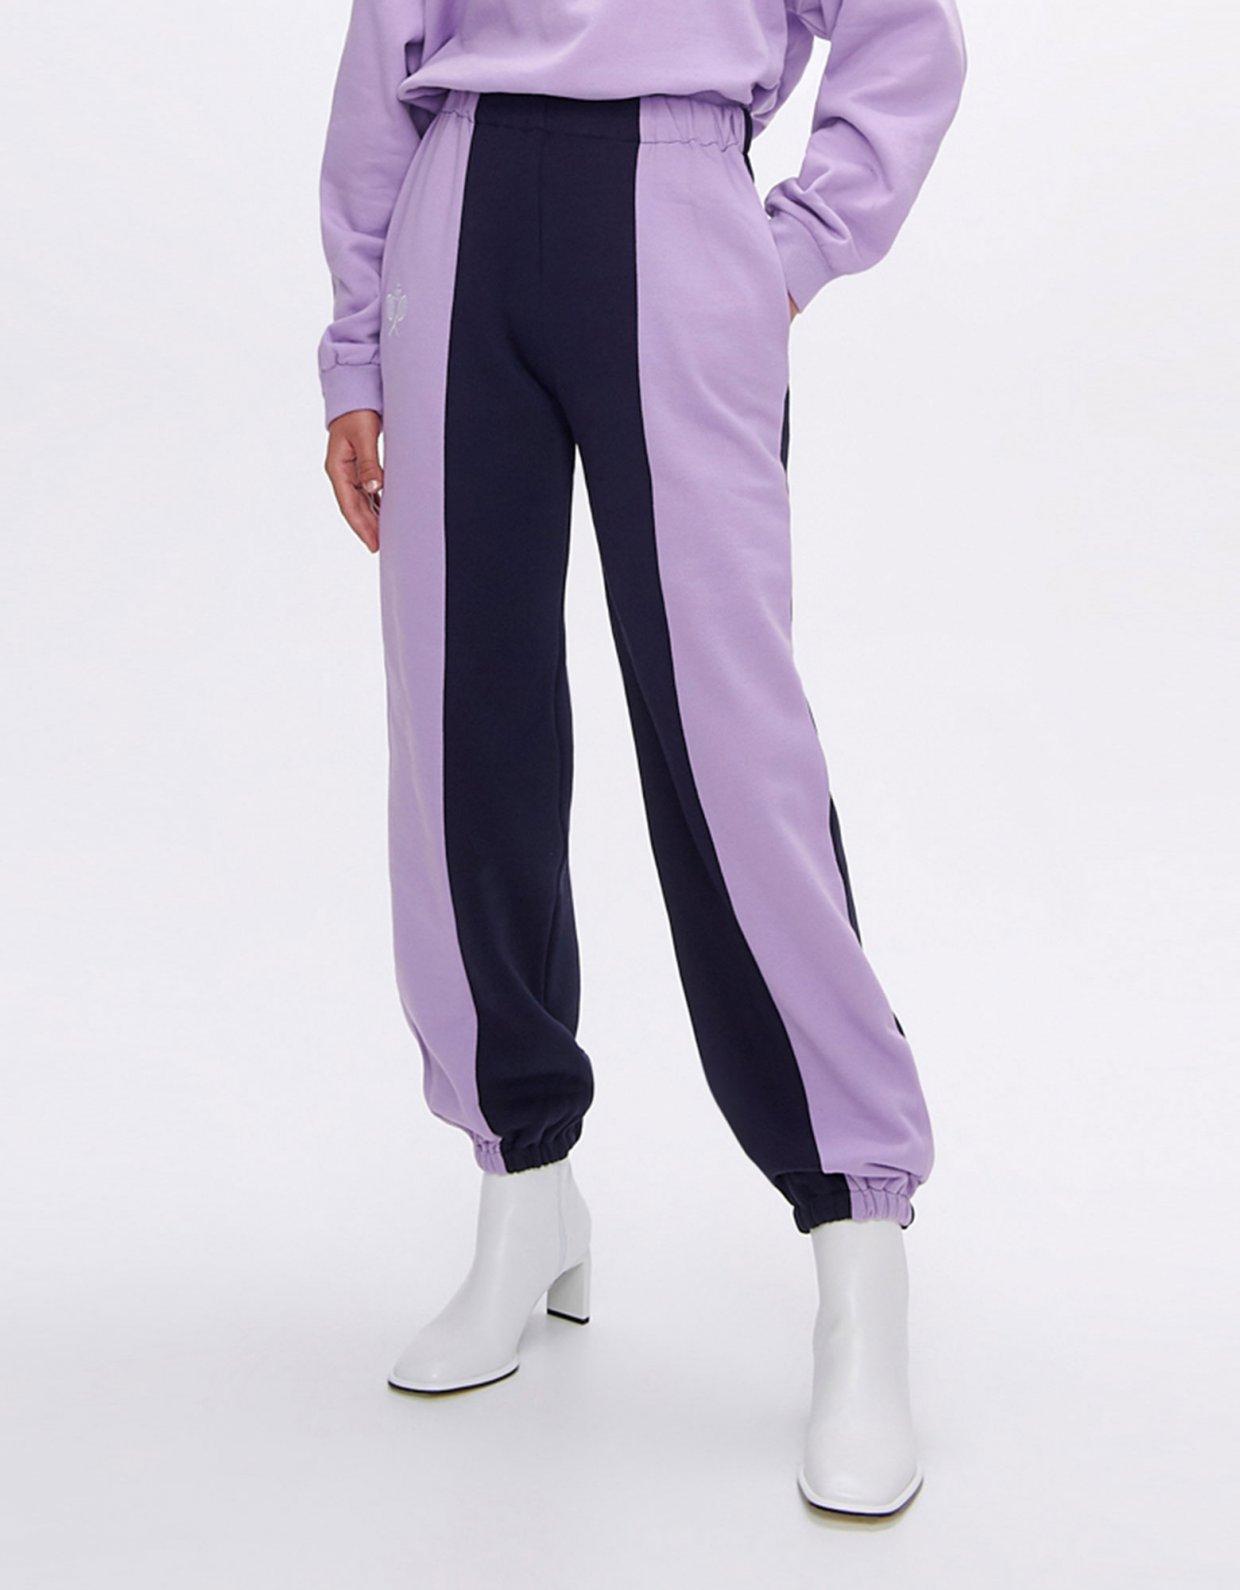 Sunset go Nadine rackets dark blue/lilac track pants